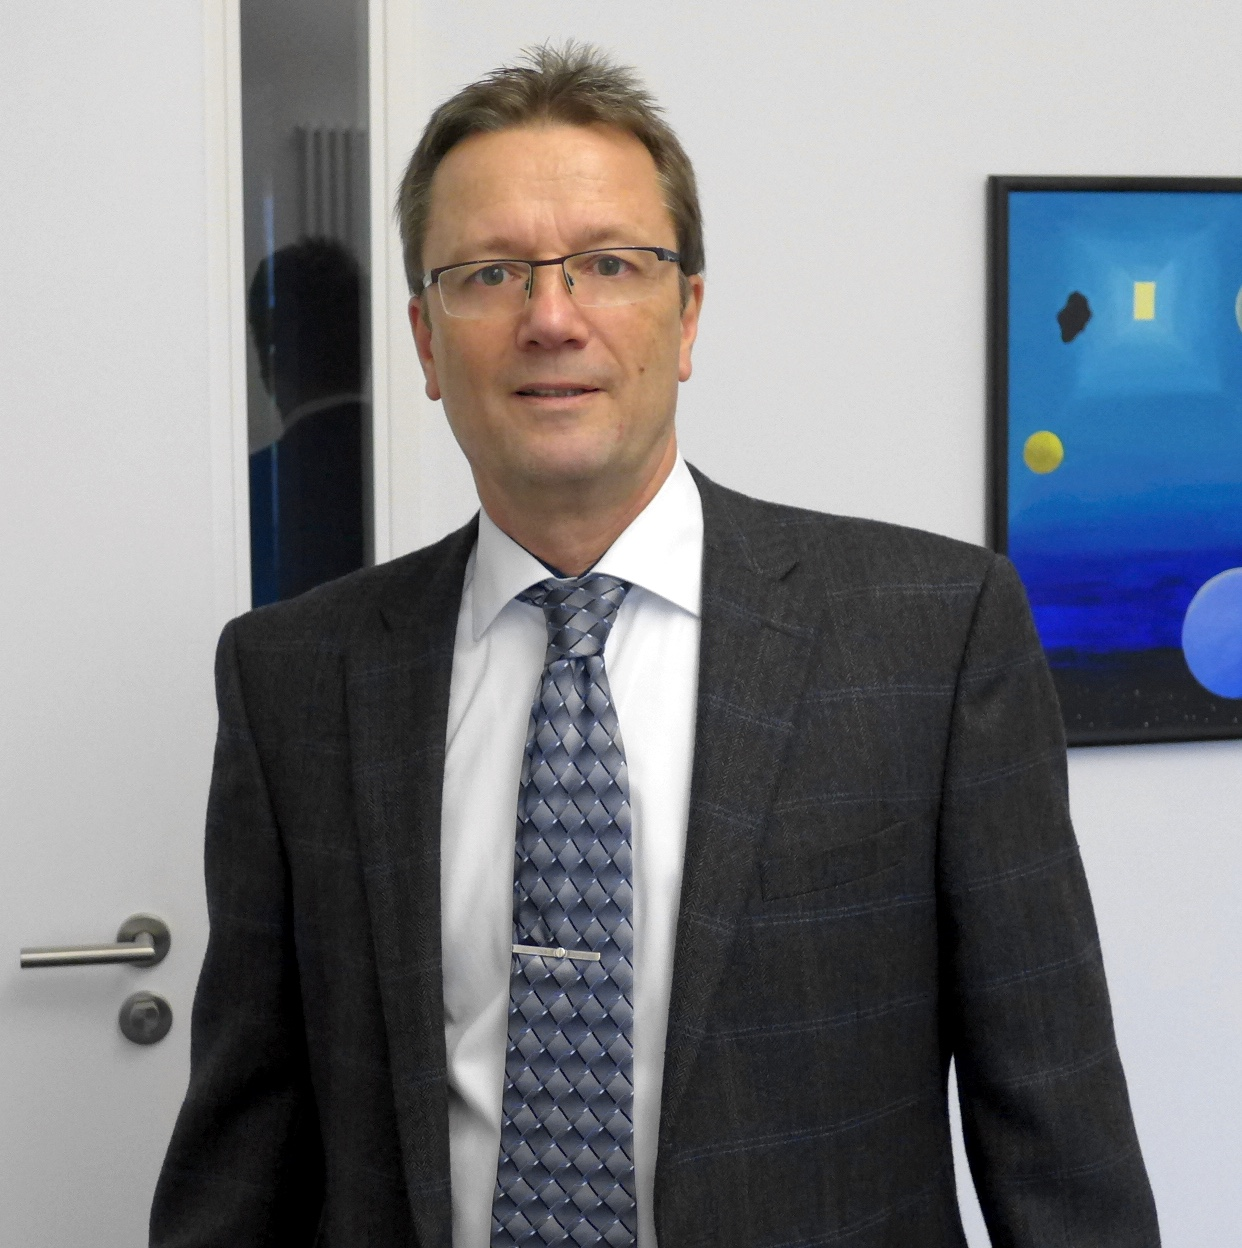 Managing director Martin Paulus